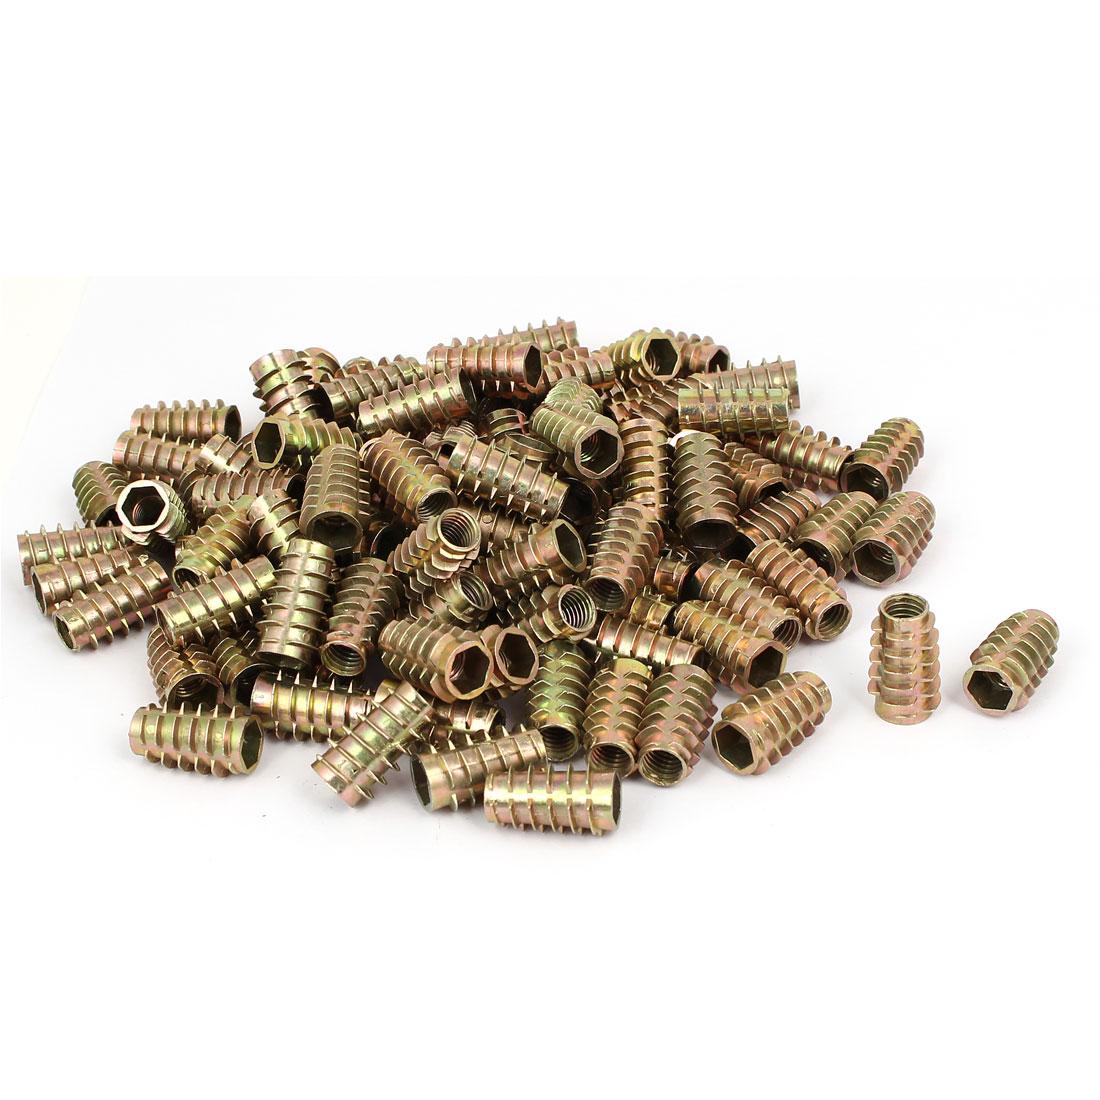 Wood Furniture Zinc Alloy Hex Socket Insert Screws E-Nuts M8x25mm 100pcs